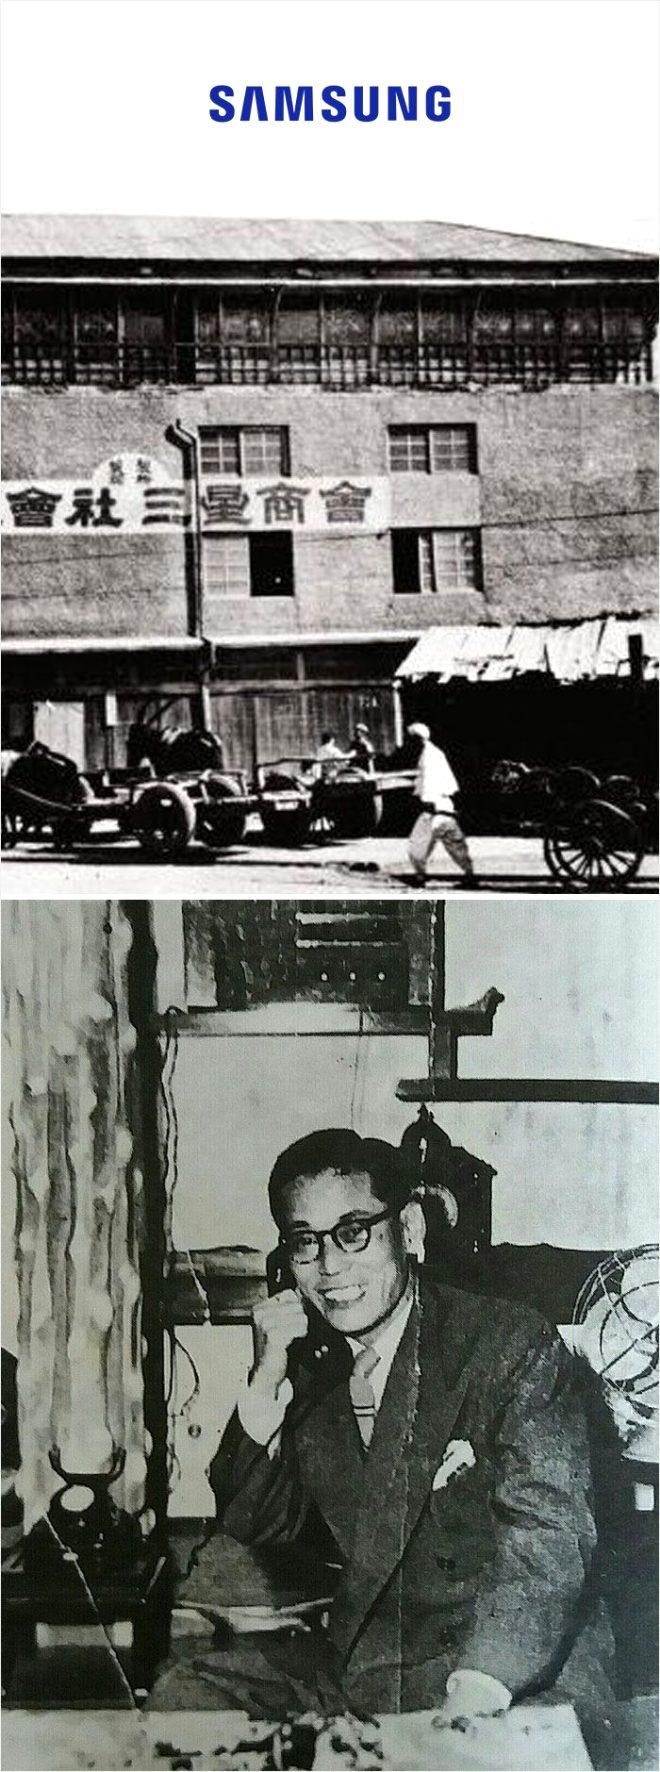 Samsung / Bakkal-Market hizmeti (1938)